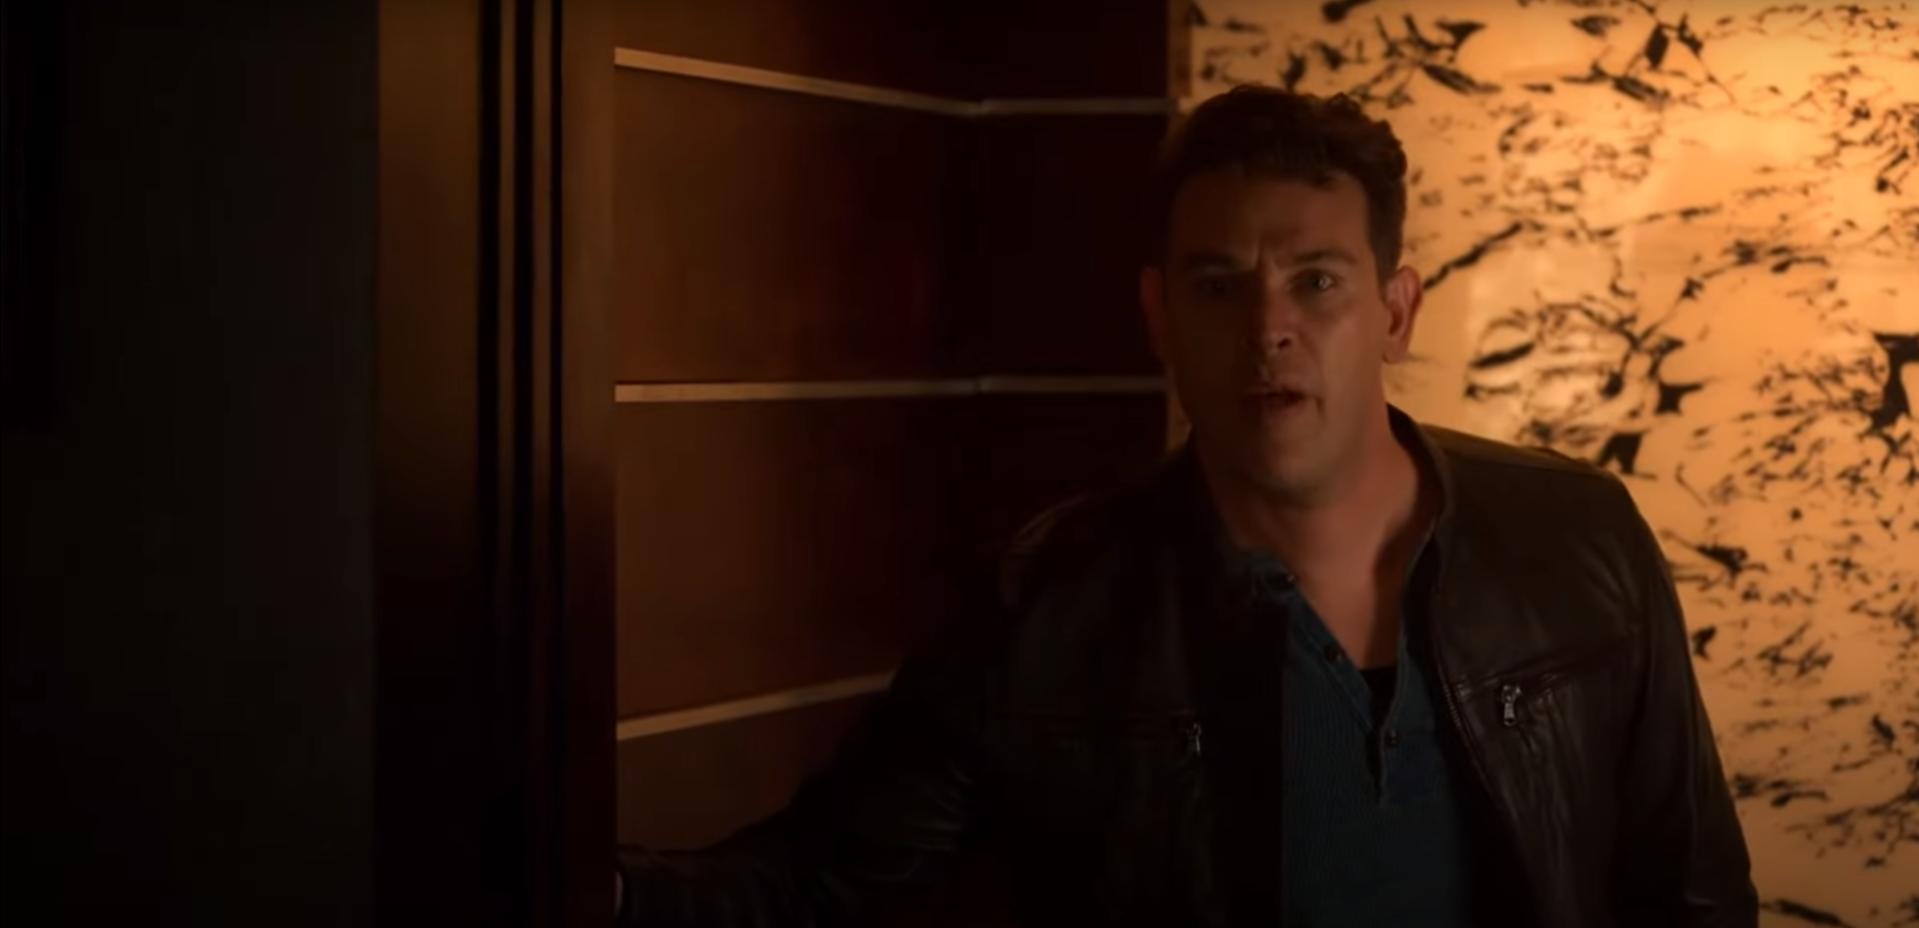 Скриншот сериала Люцифер 5 сезон Эспиноза